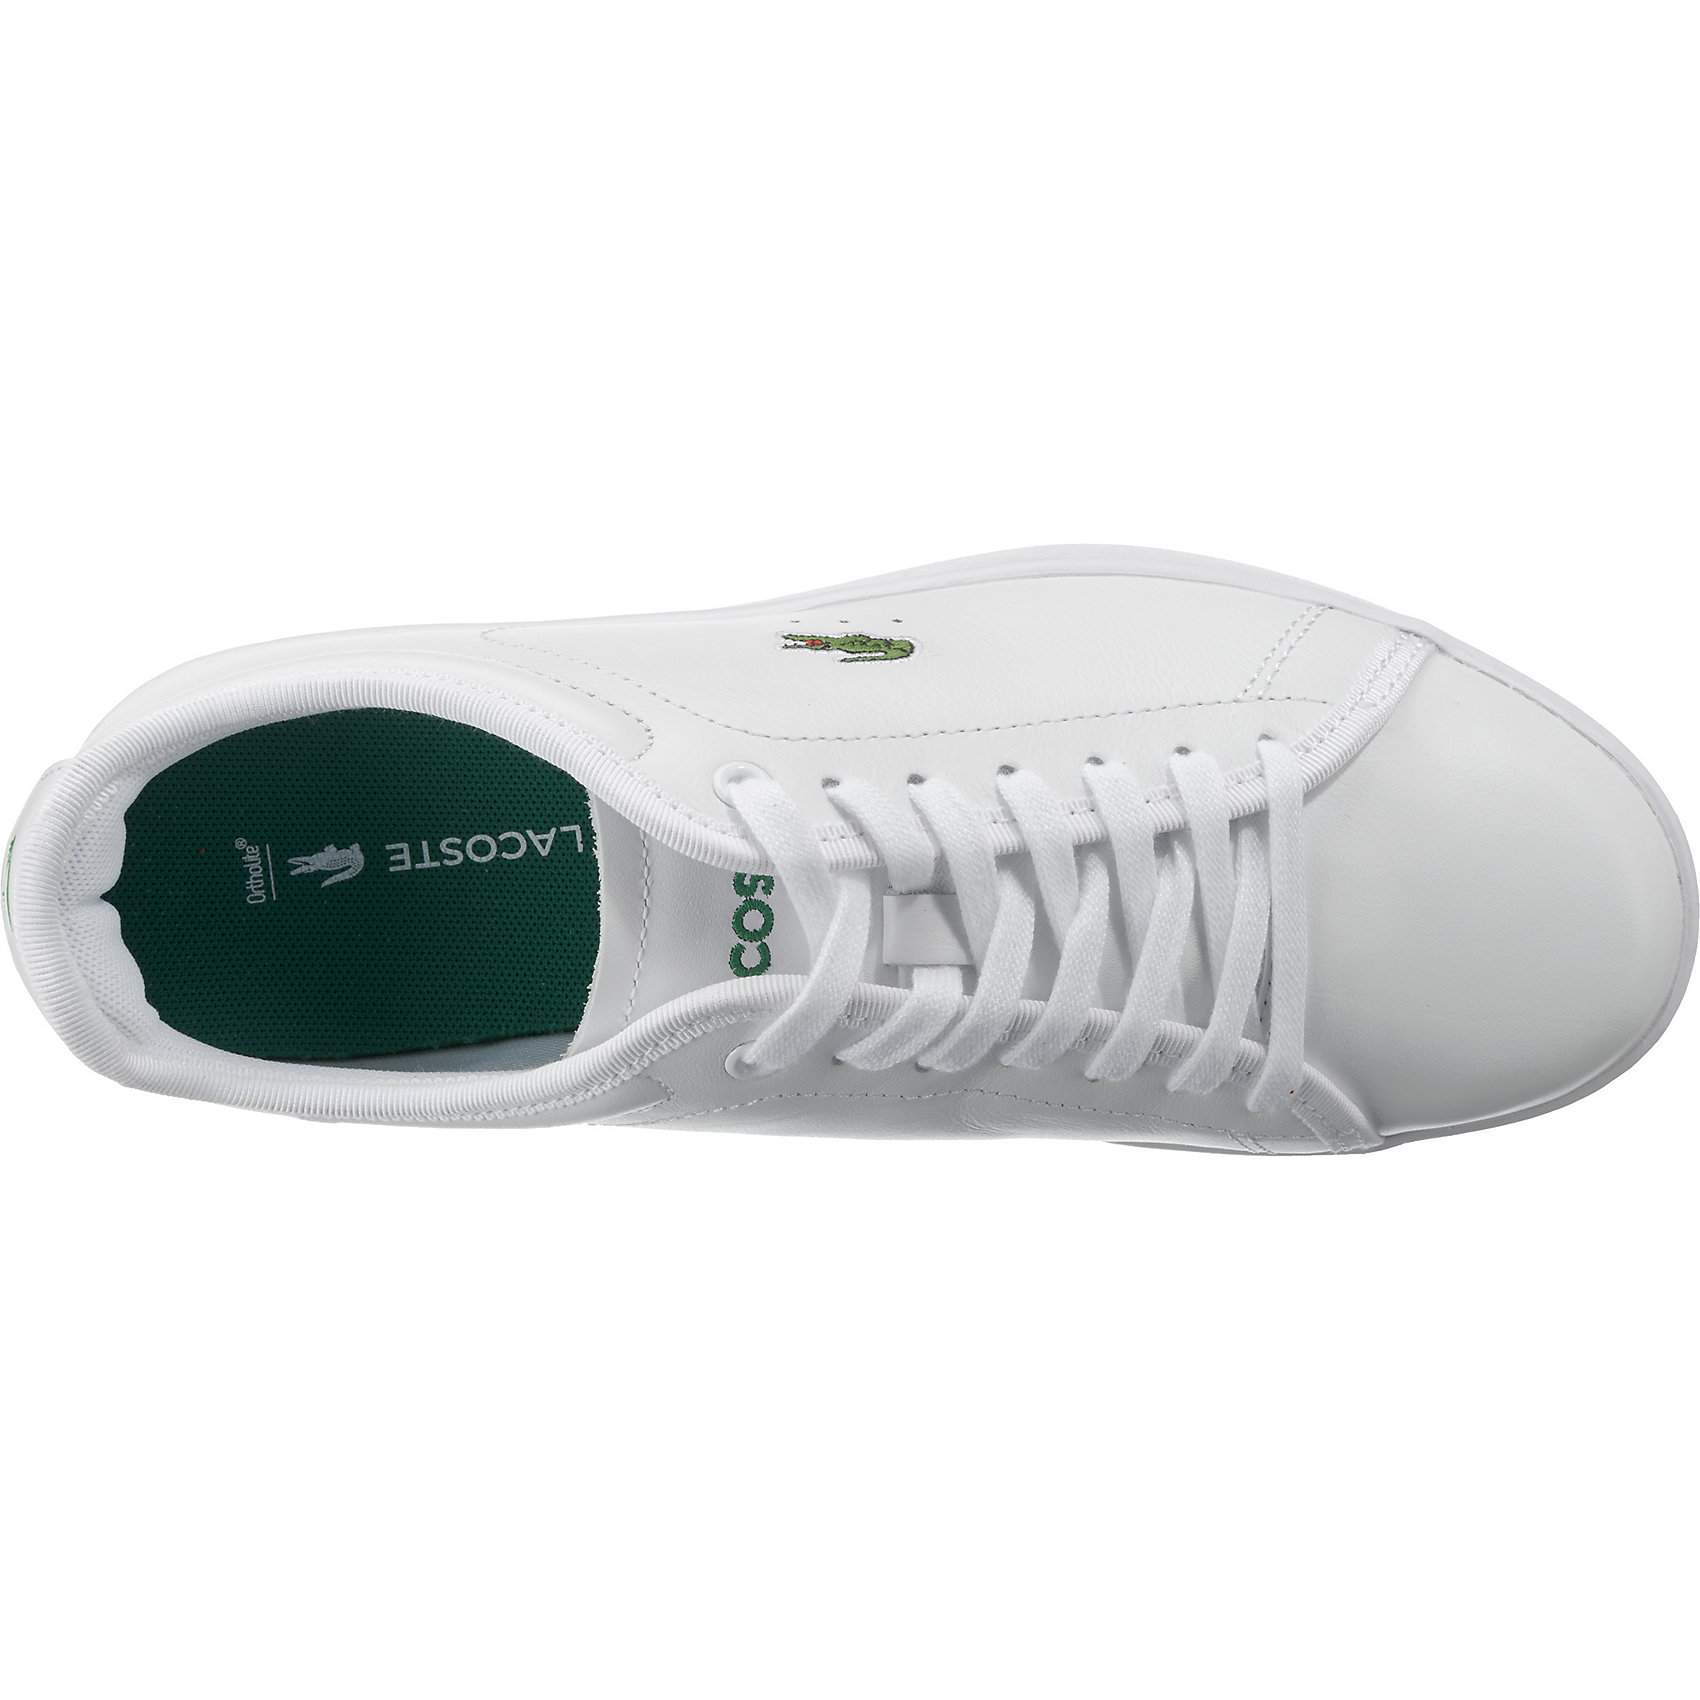 outlet store e5497 bdfca ... Nike Men s AIR HUARACHE RUN  91 QS MAGENTA MAGENTA MAGENTA Shoes White Black-  ...